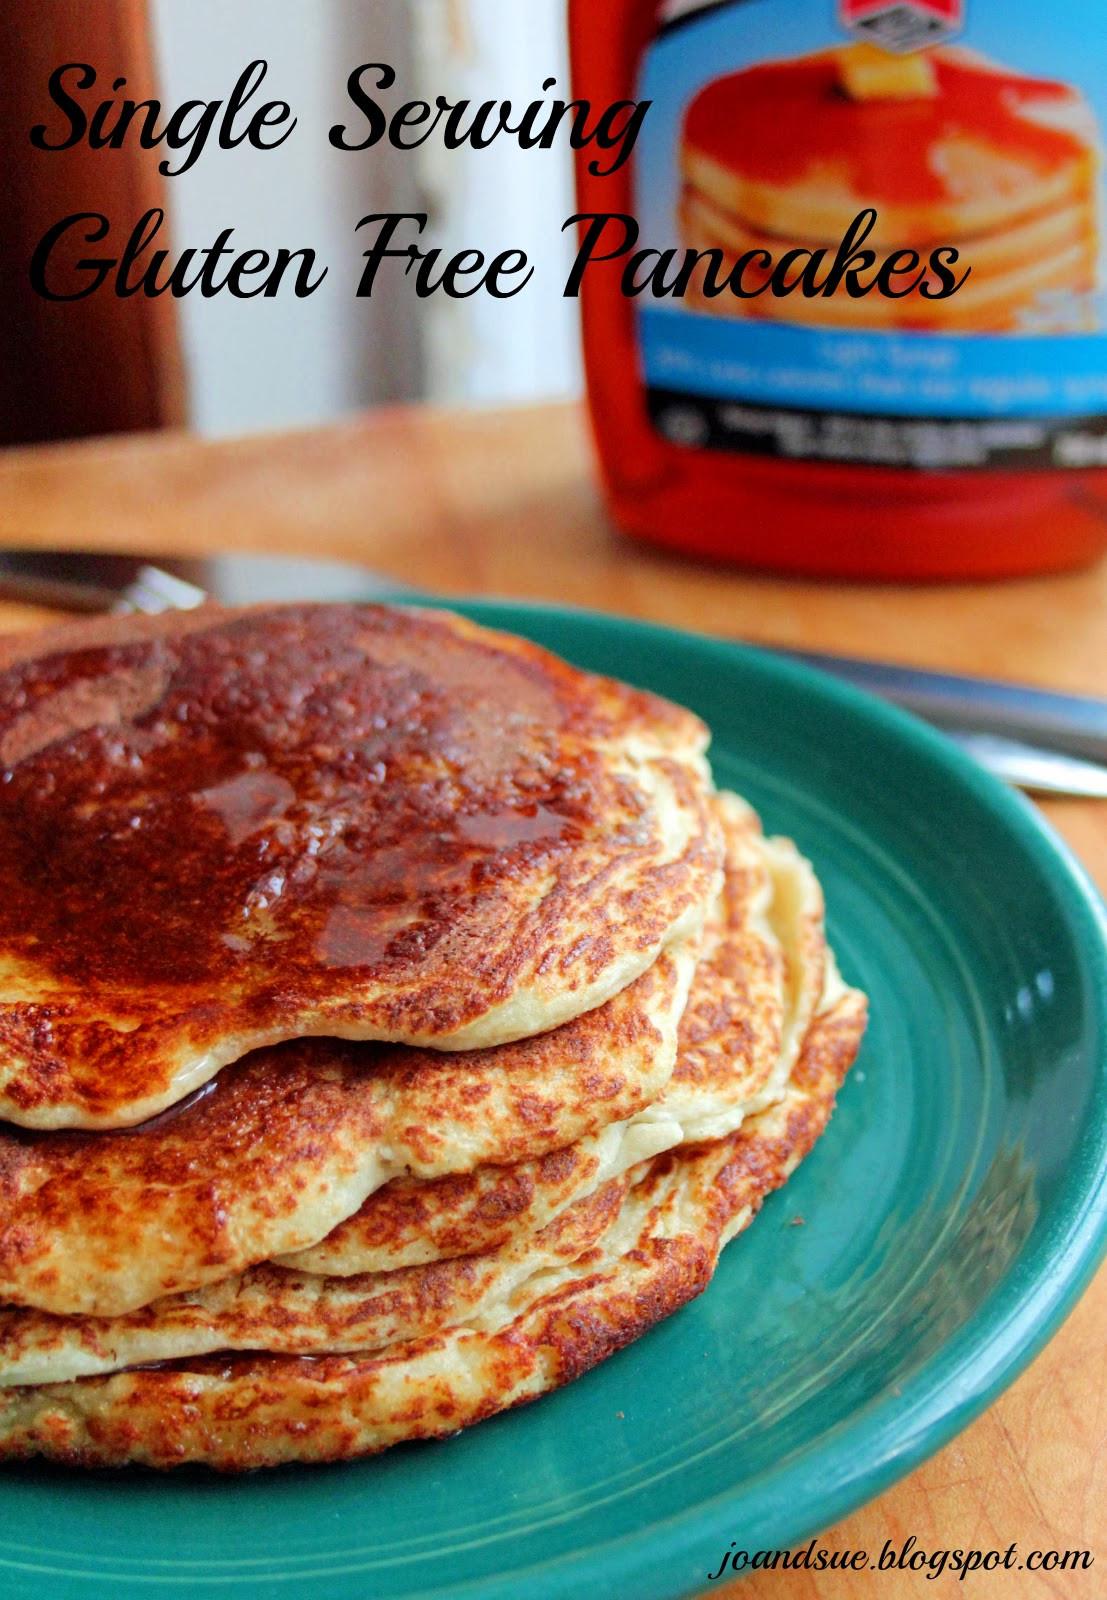 Gluten Free Pancakes  Jo and Sue Single Serving Gluten Free Pancakes